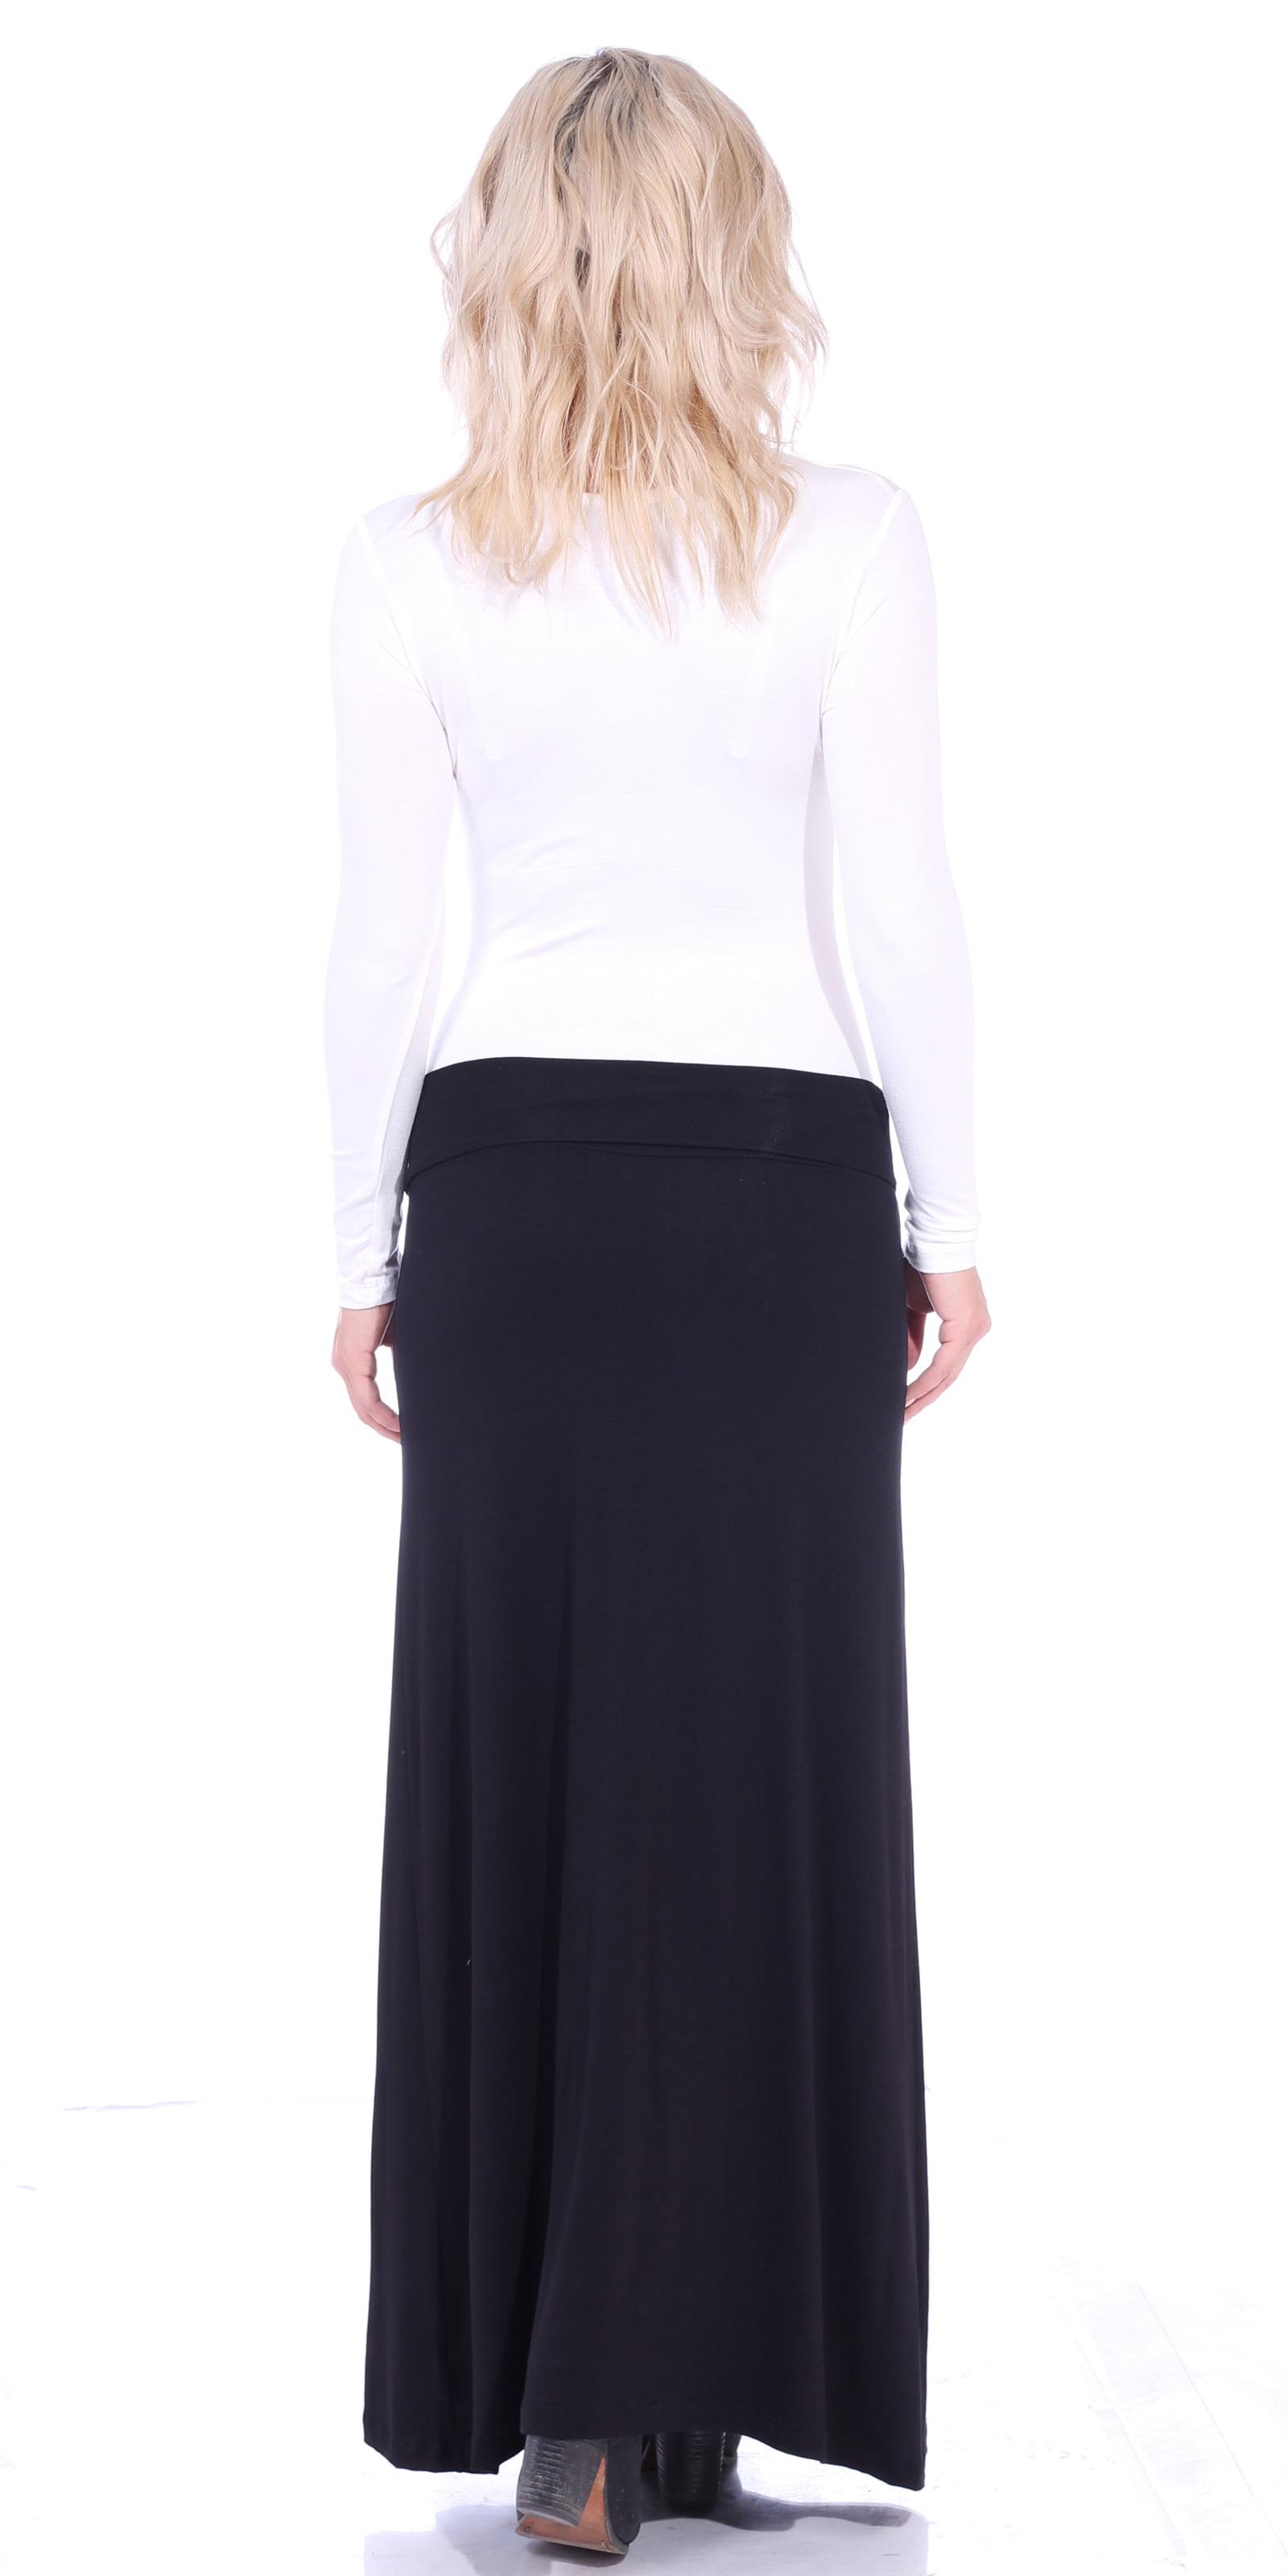 cc8d62db994411 Flowy Maxi Skirt Black – DACC